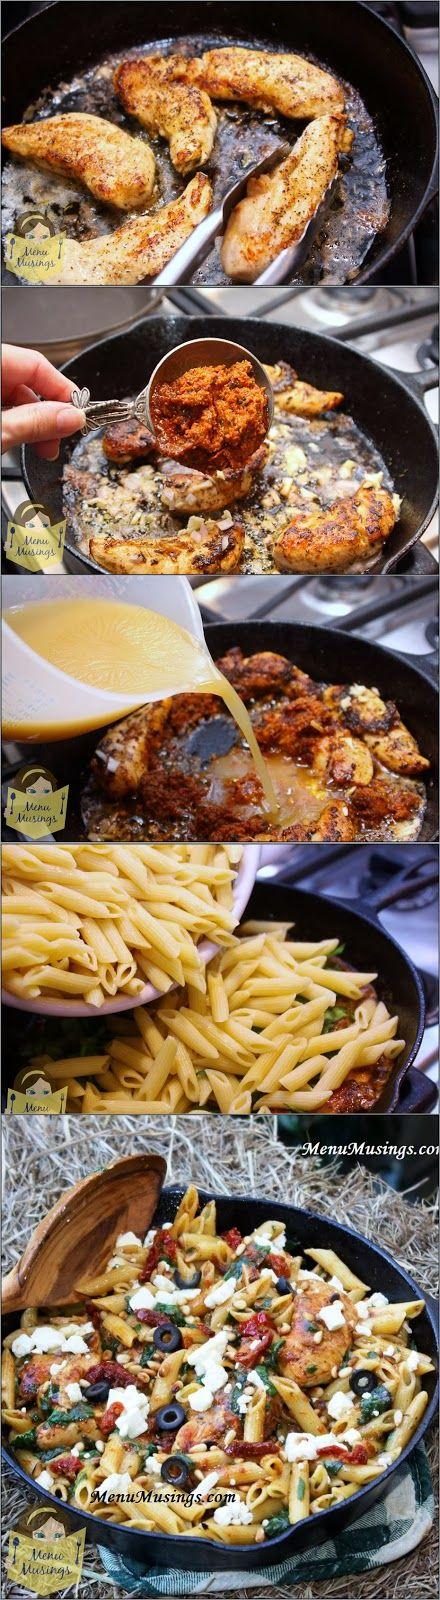 Menu Musings of a Modern American Mom: Mediterranean Chicken Pasta